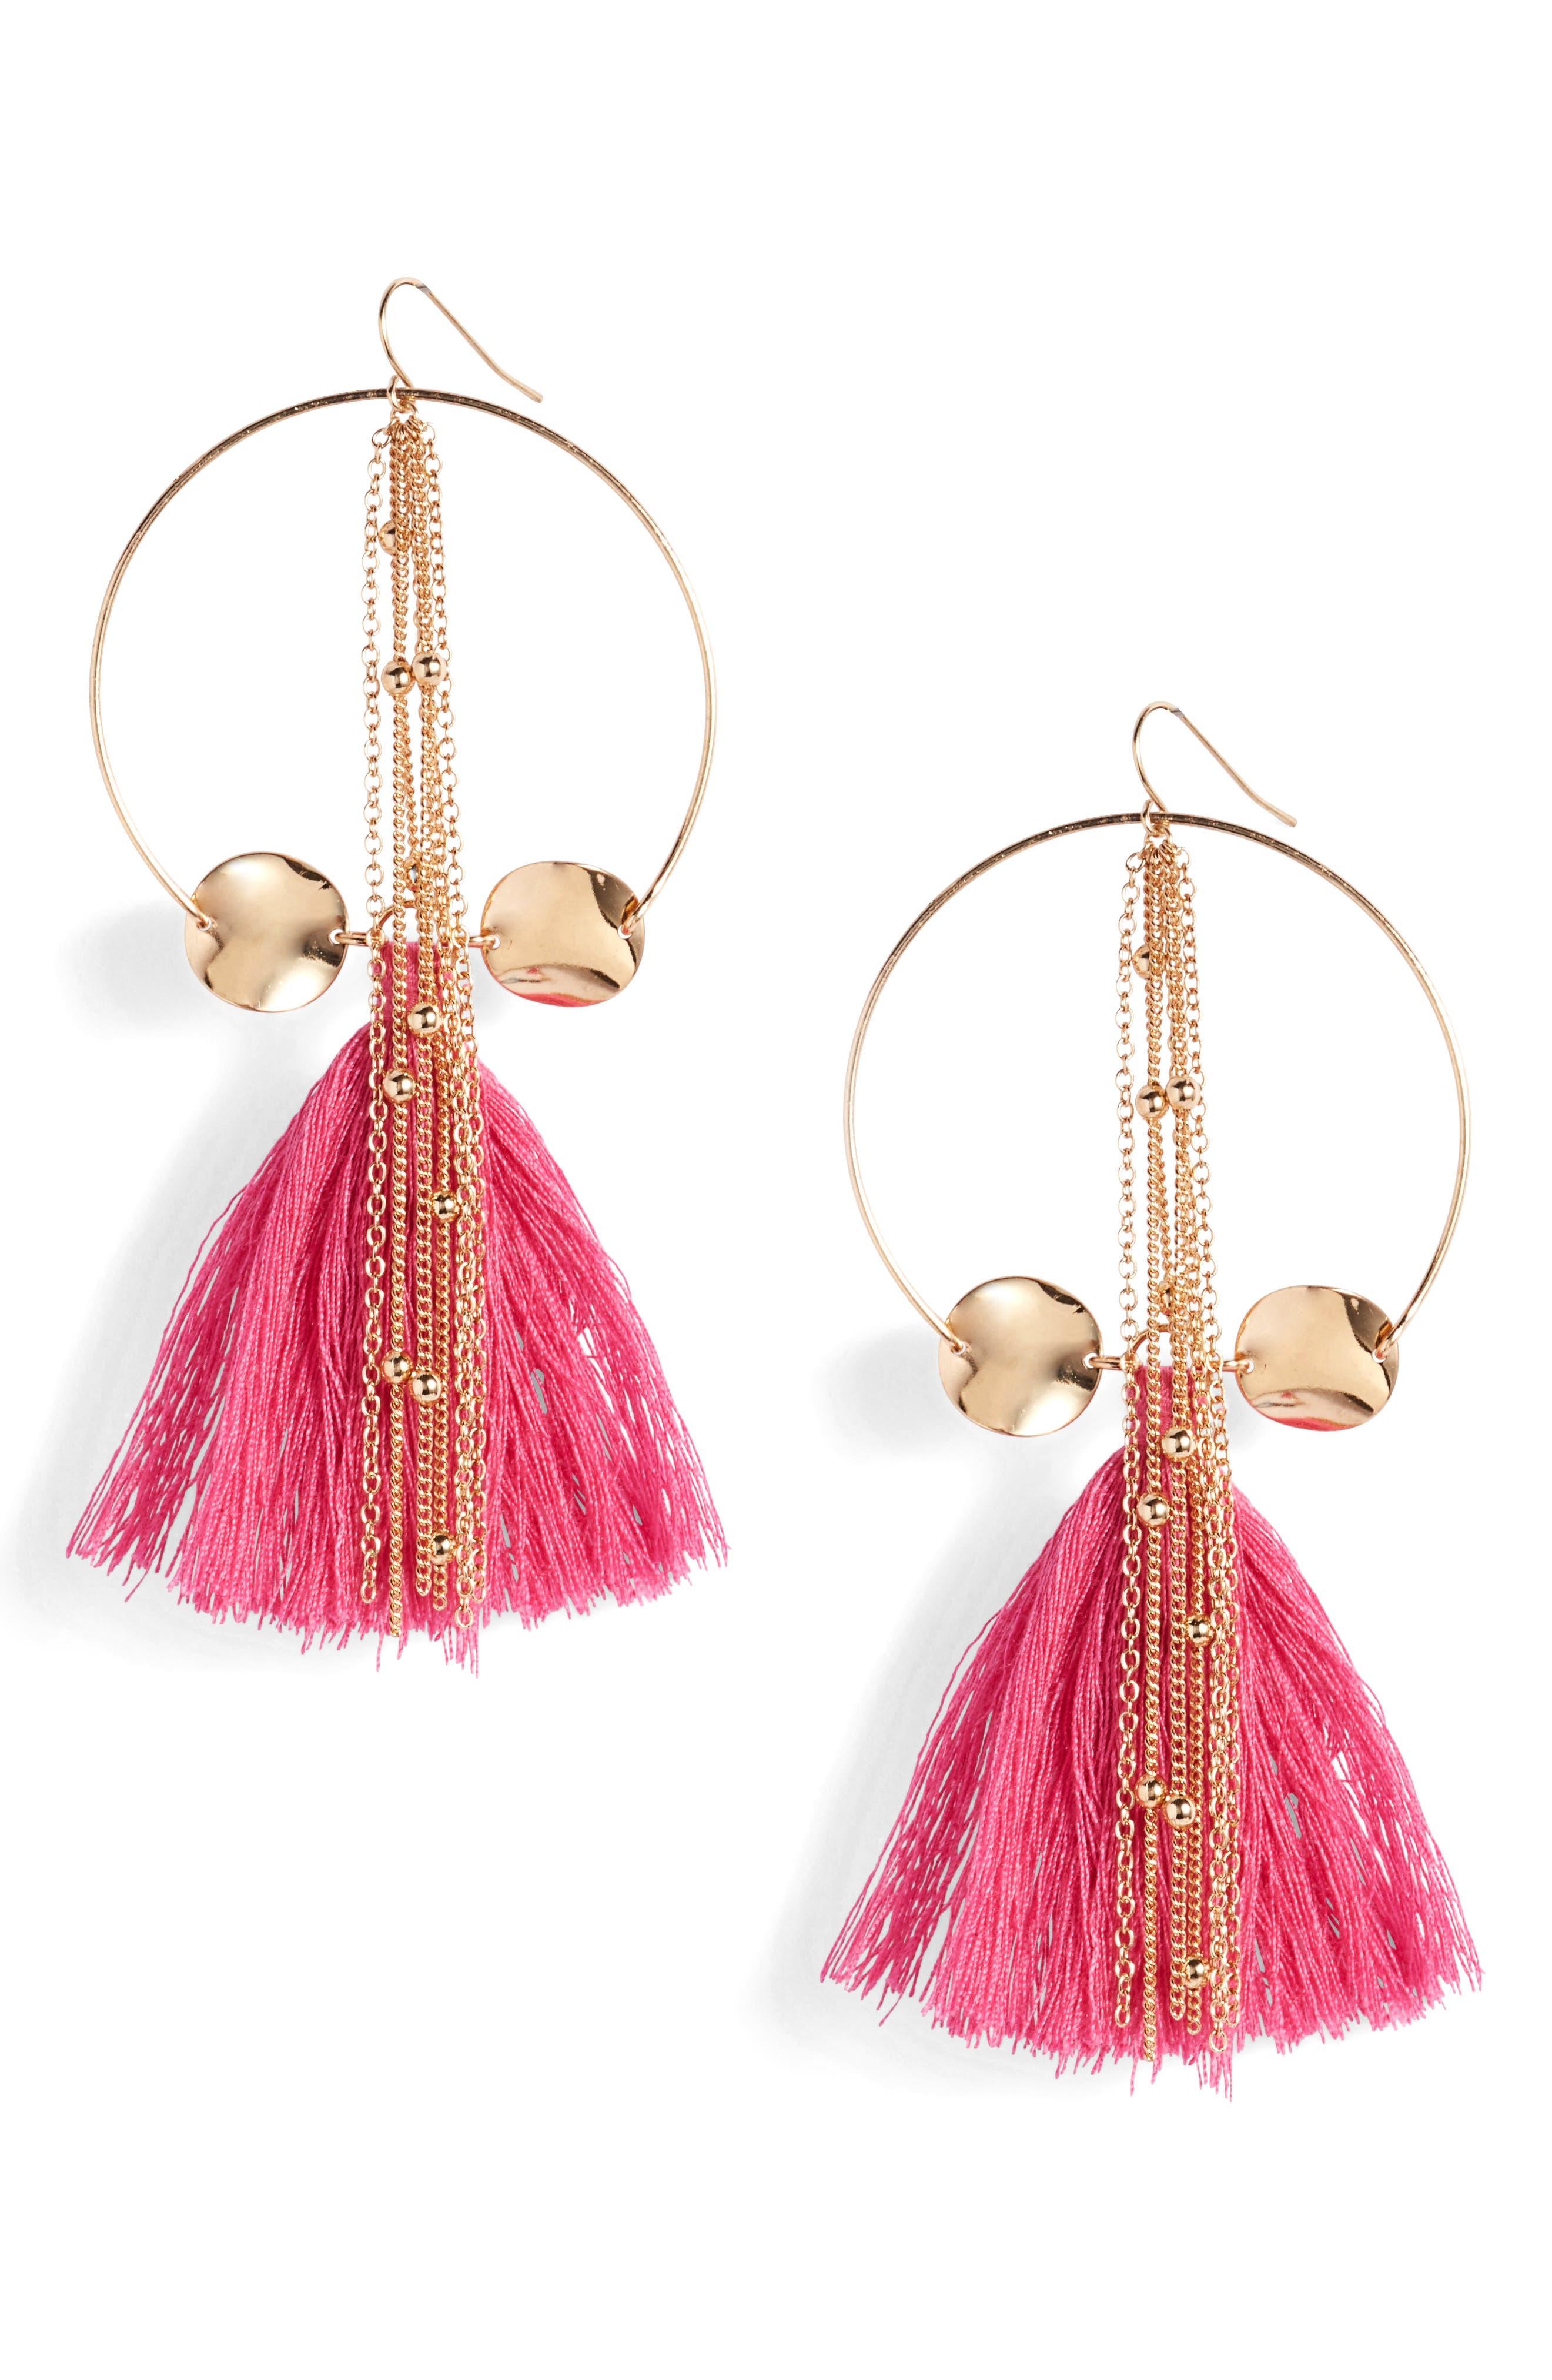 Tassel Hoop Earrings,                             Main thumbnail 1, color,                             650